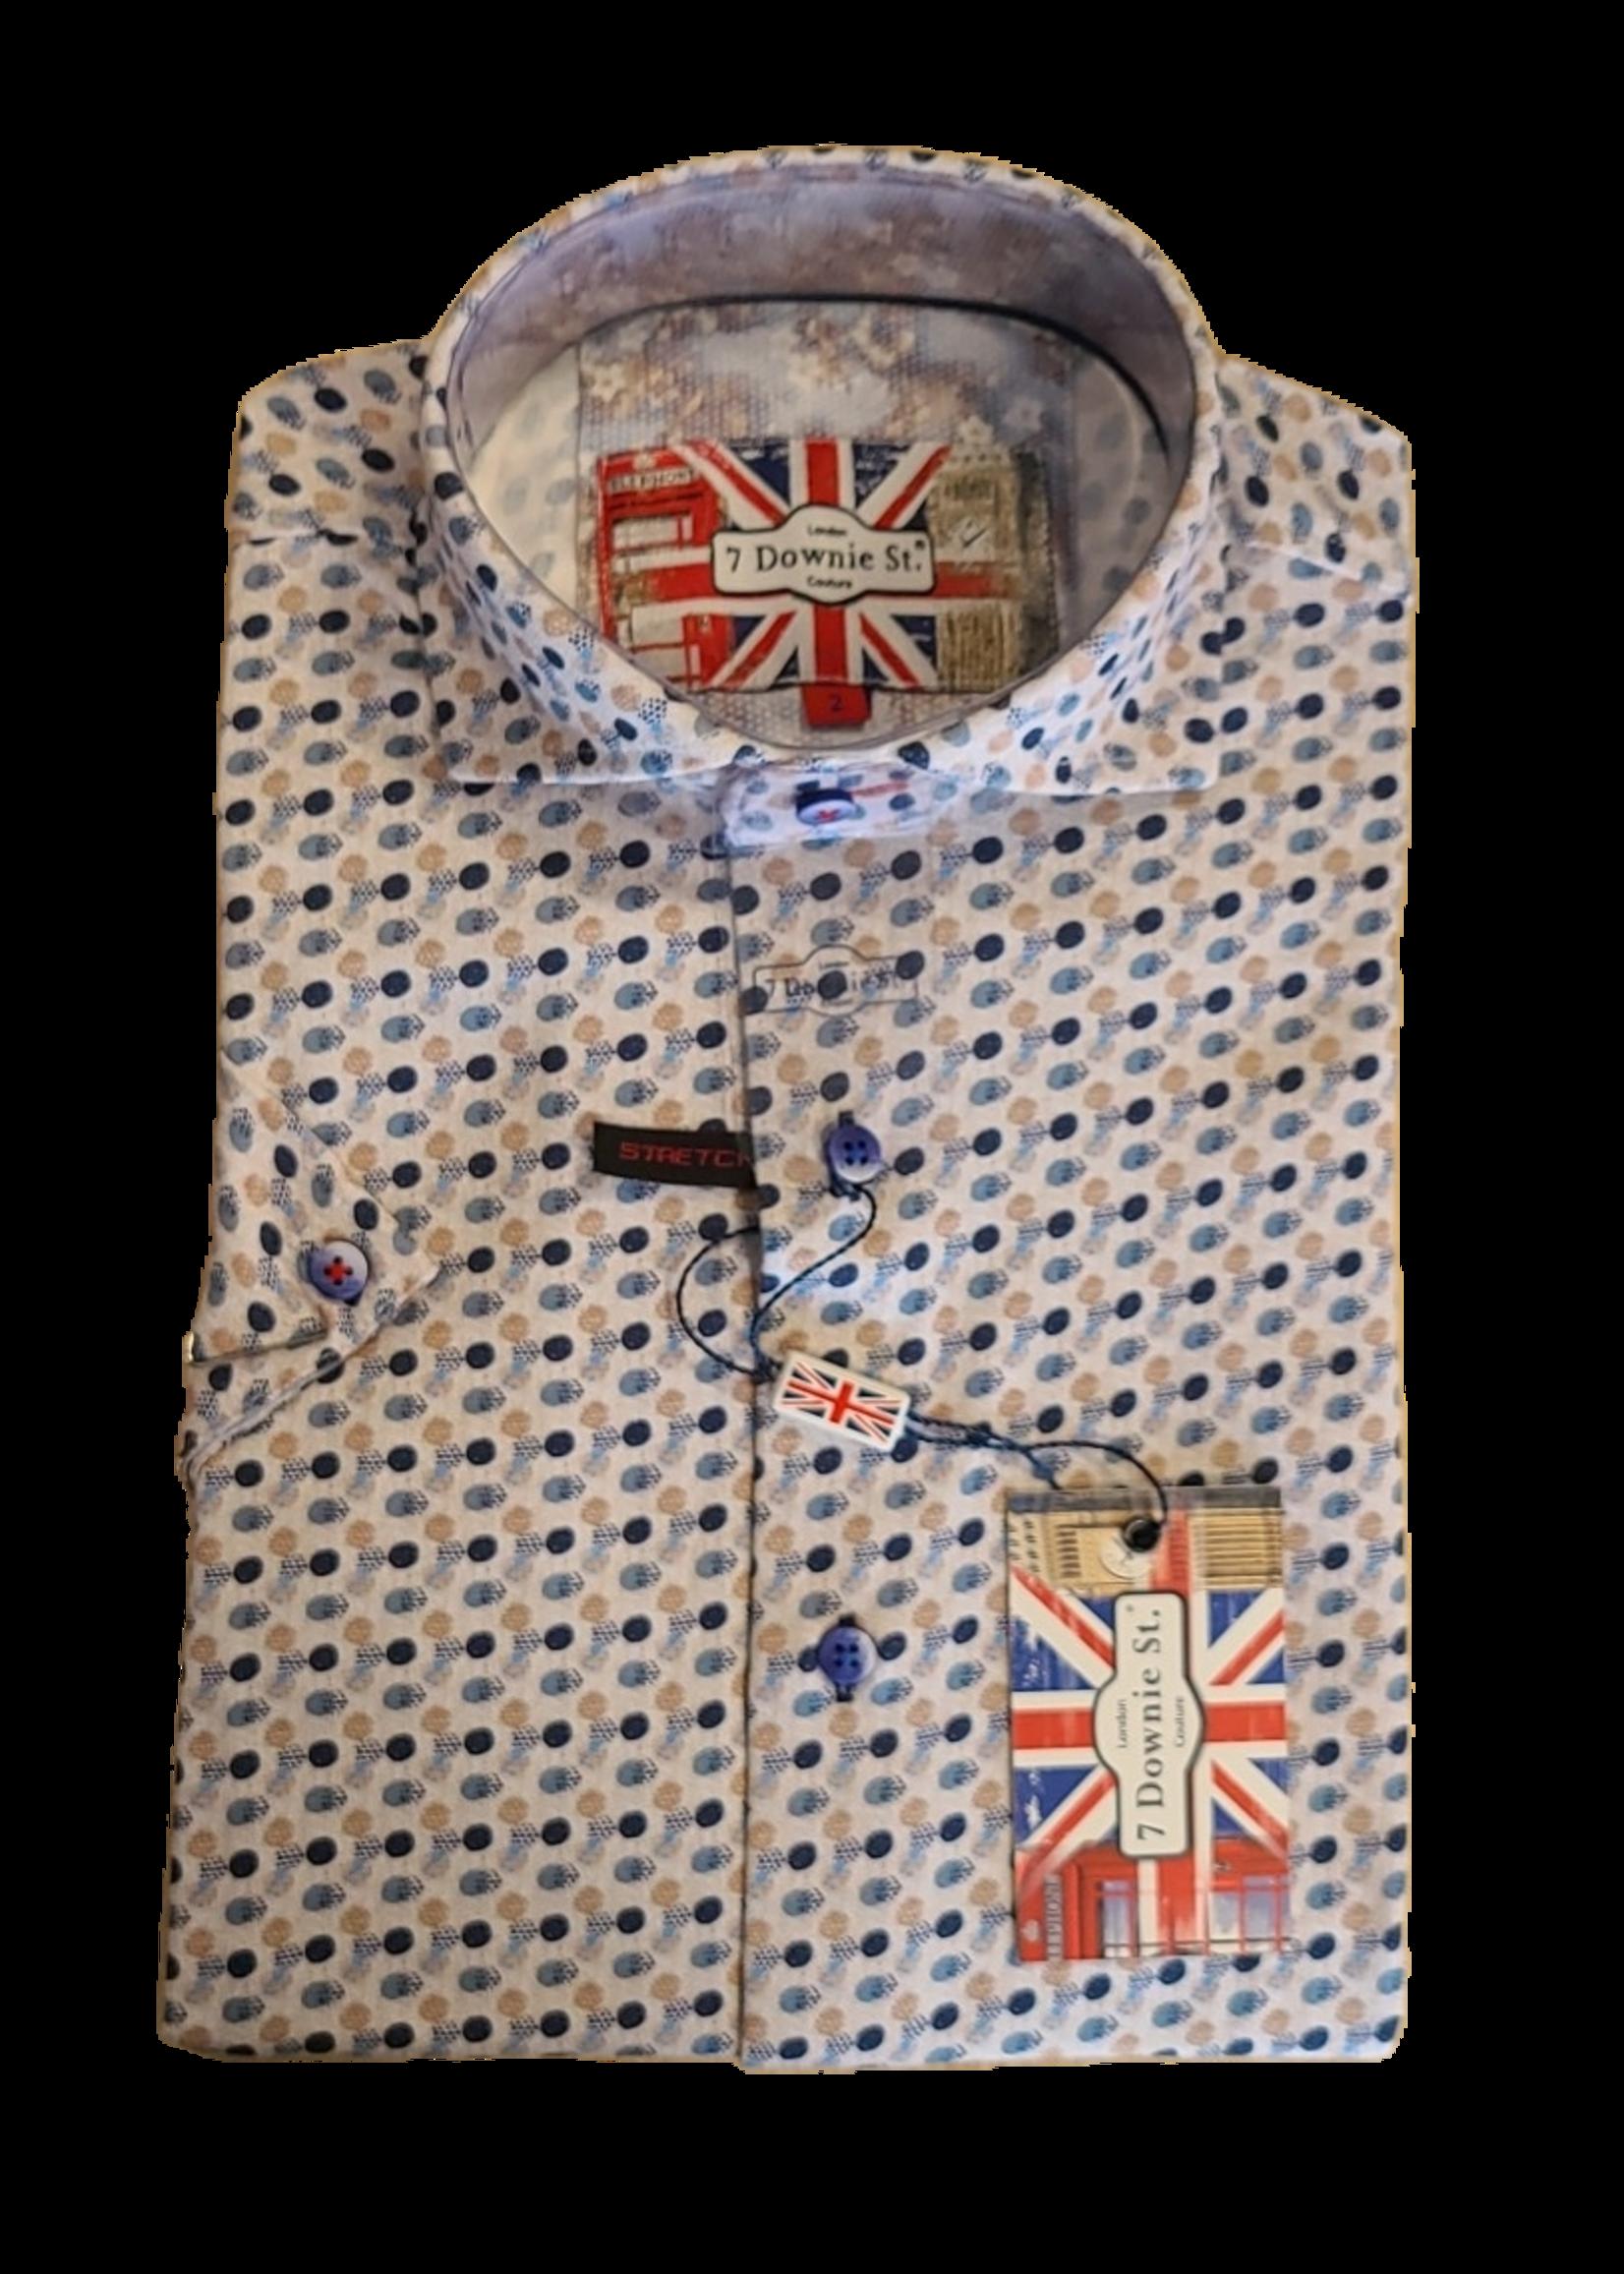 7 Downie St. 7 Downie St. Short Sleeve Shirt 7032